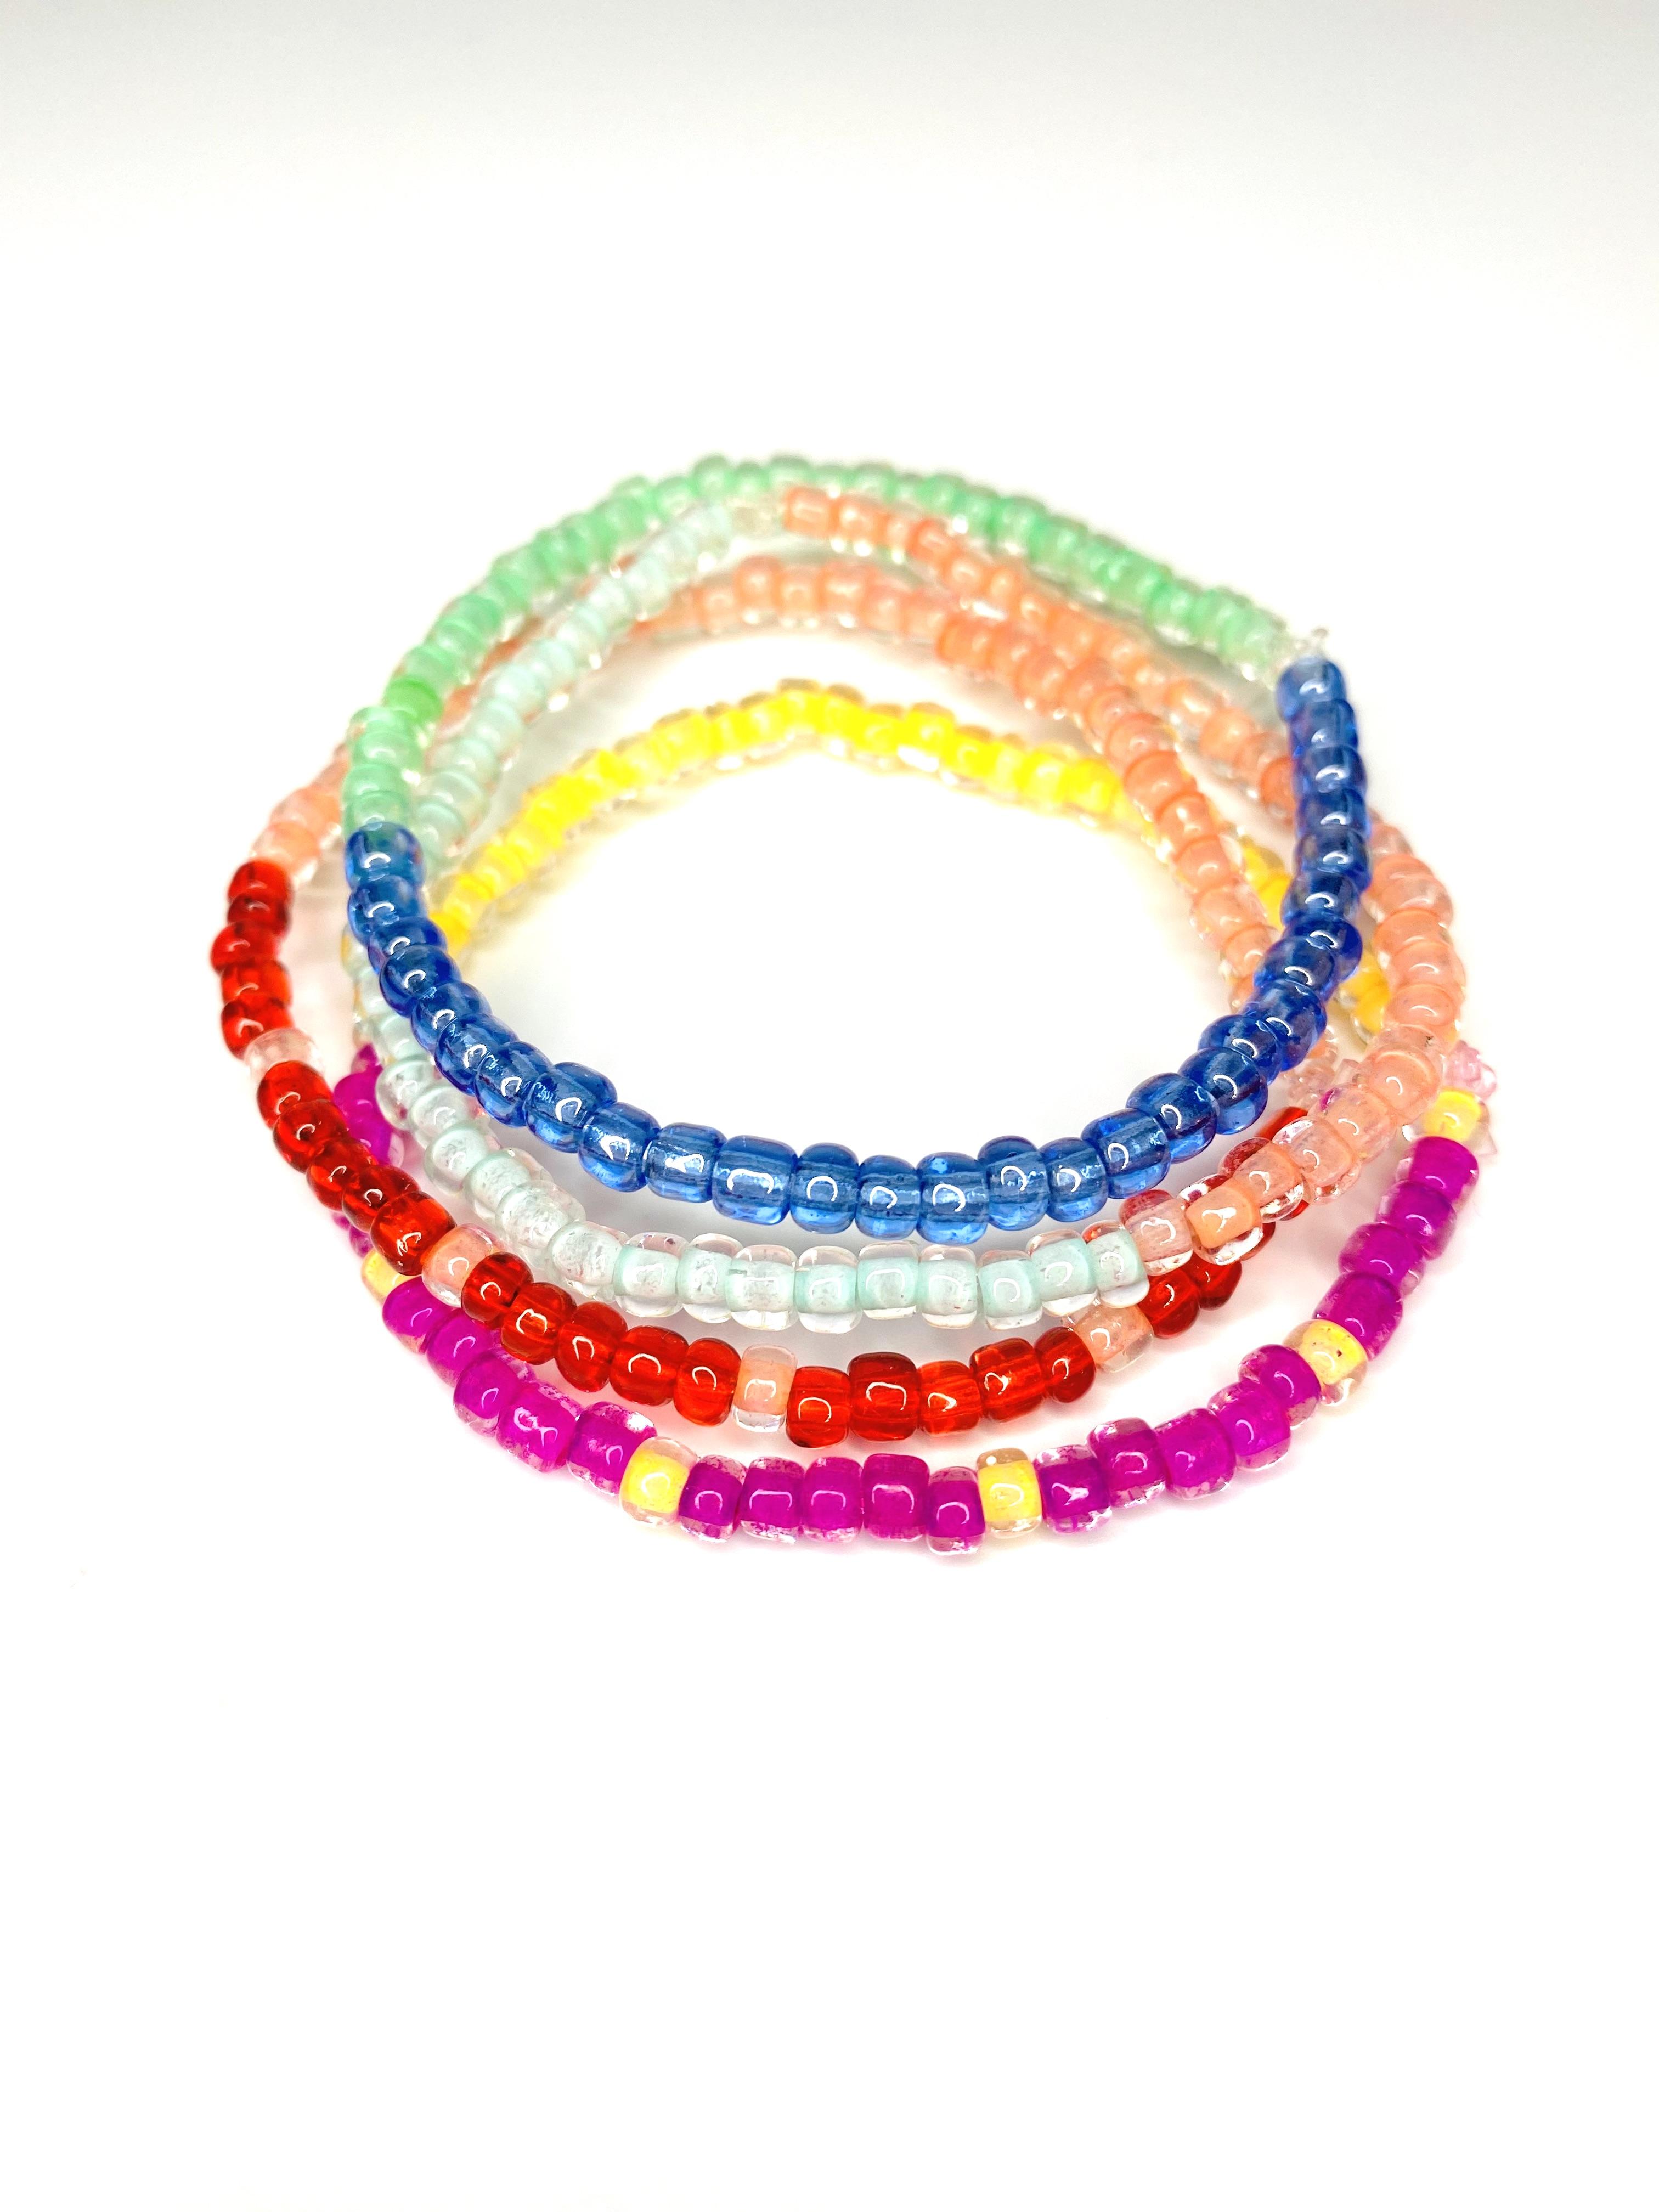 Beaded Bracelets - Set of 4